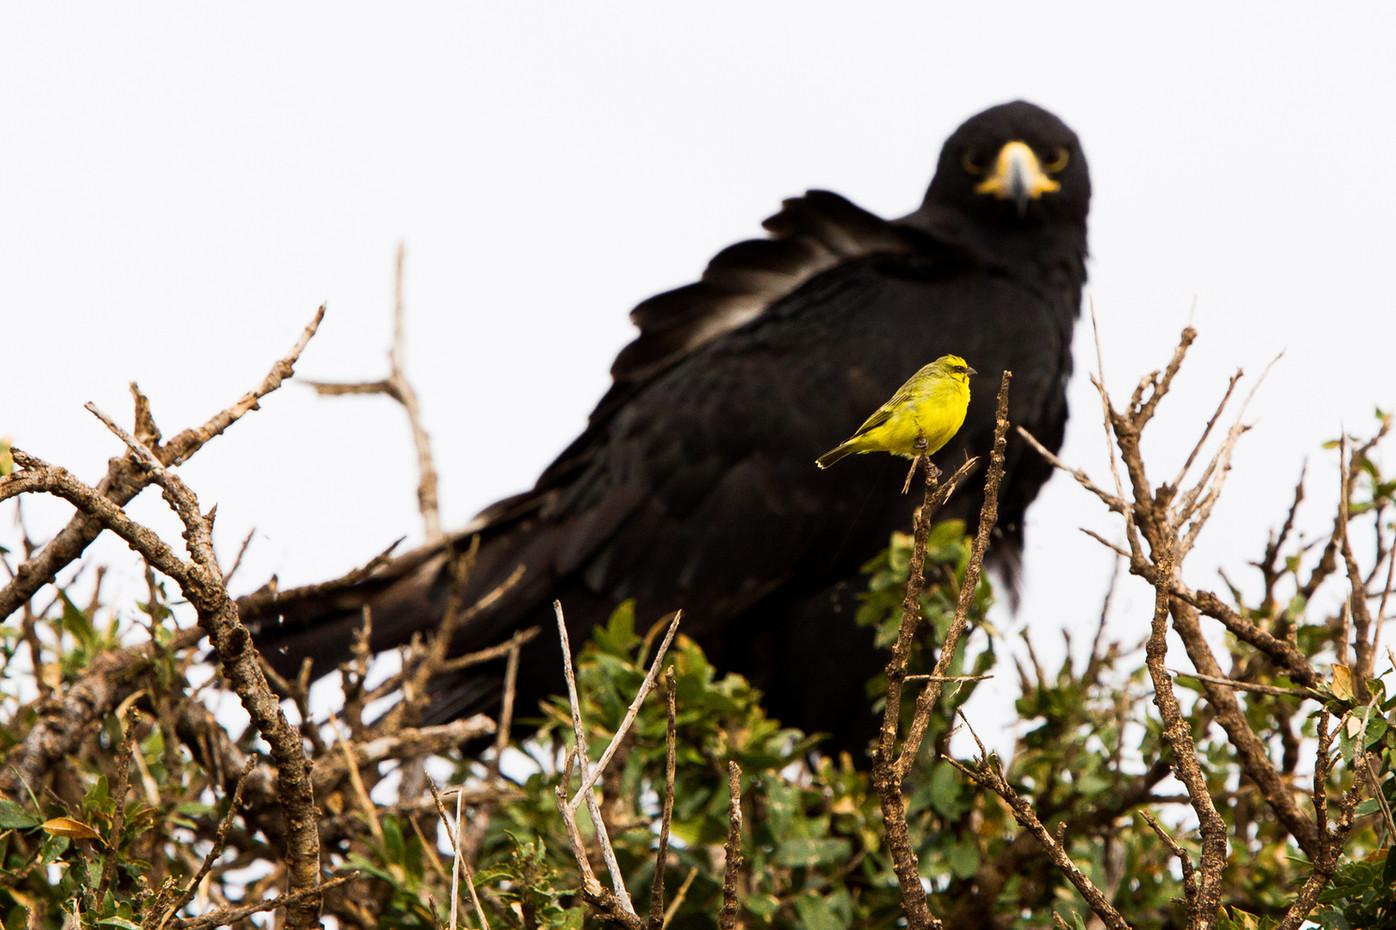 Black Eagle & anary in Masai Mara, Kenya